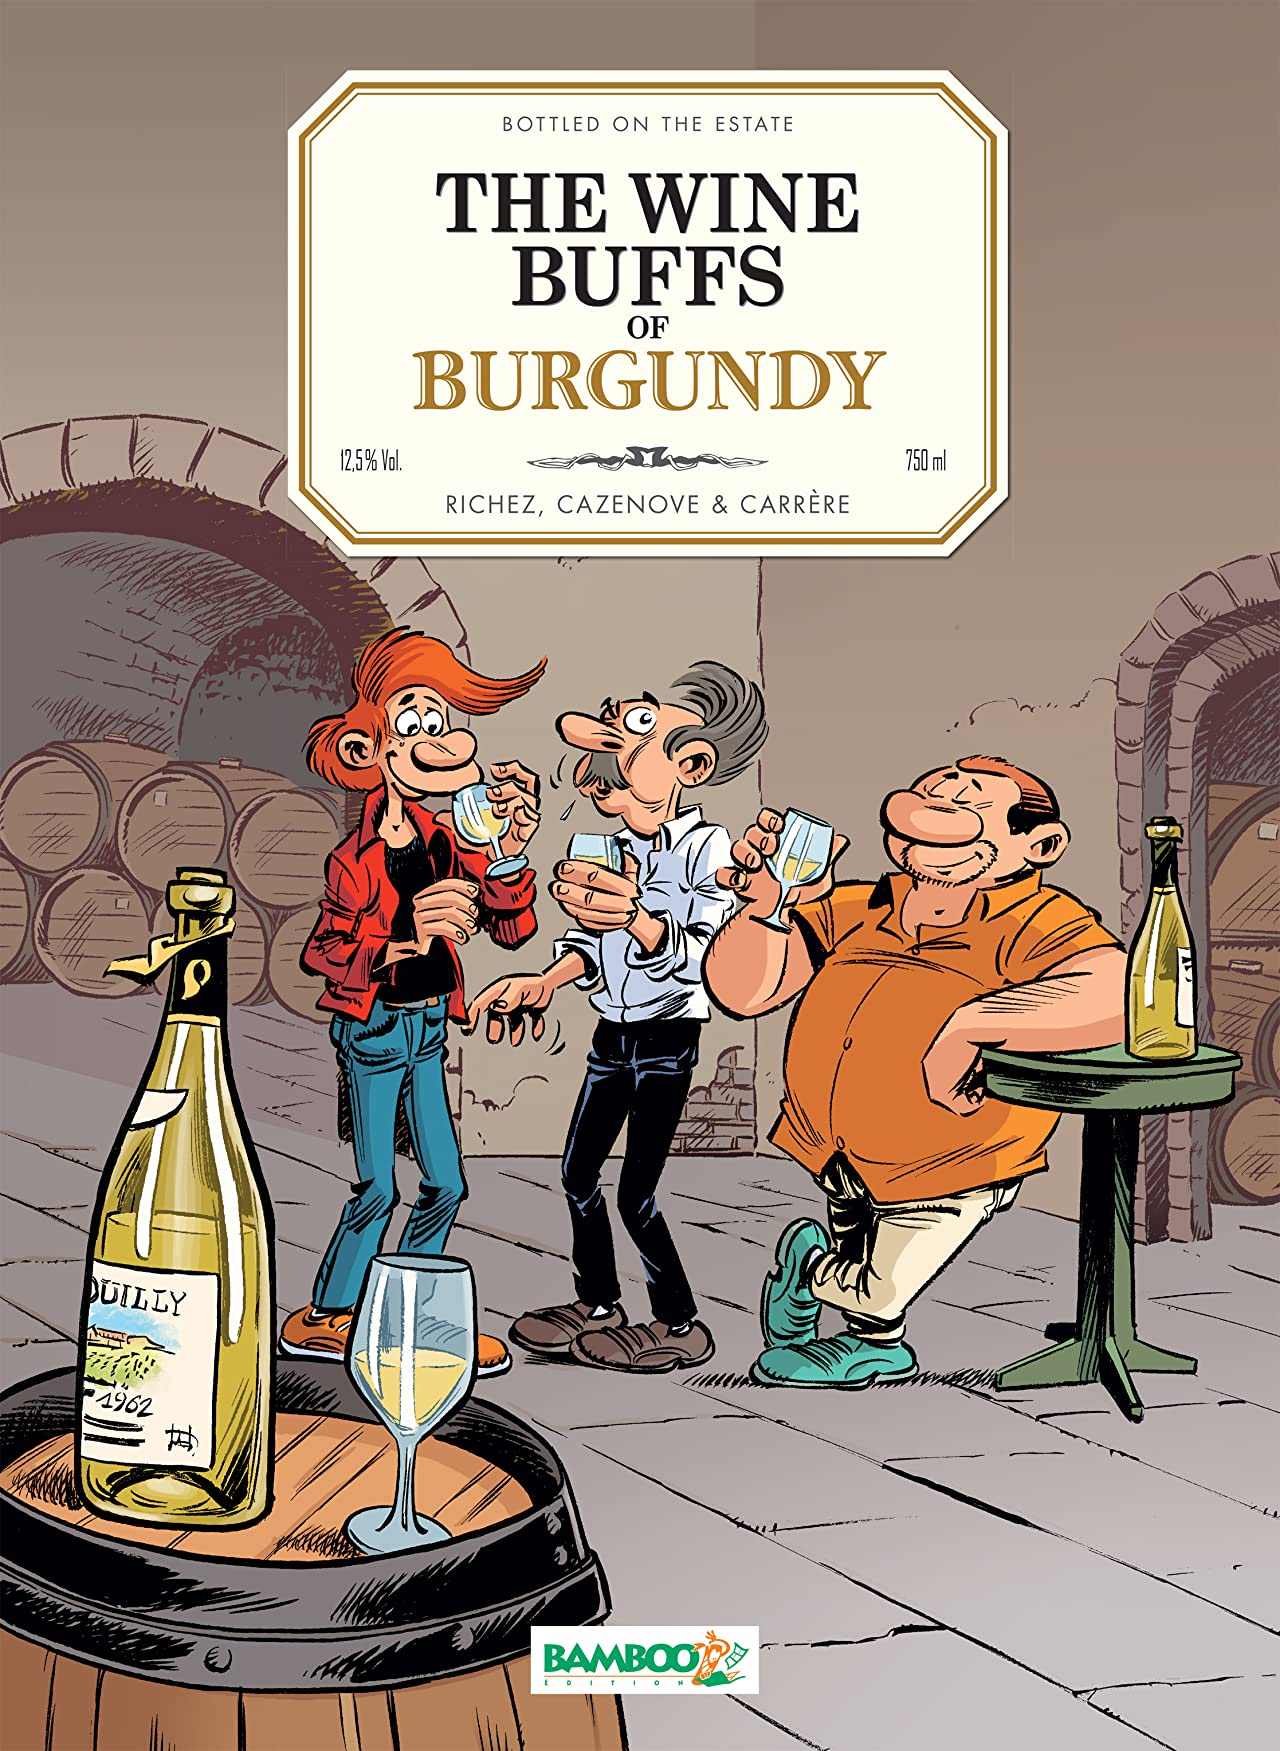 Les Fondus du vin: The Wine buffs of Burgundy